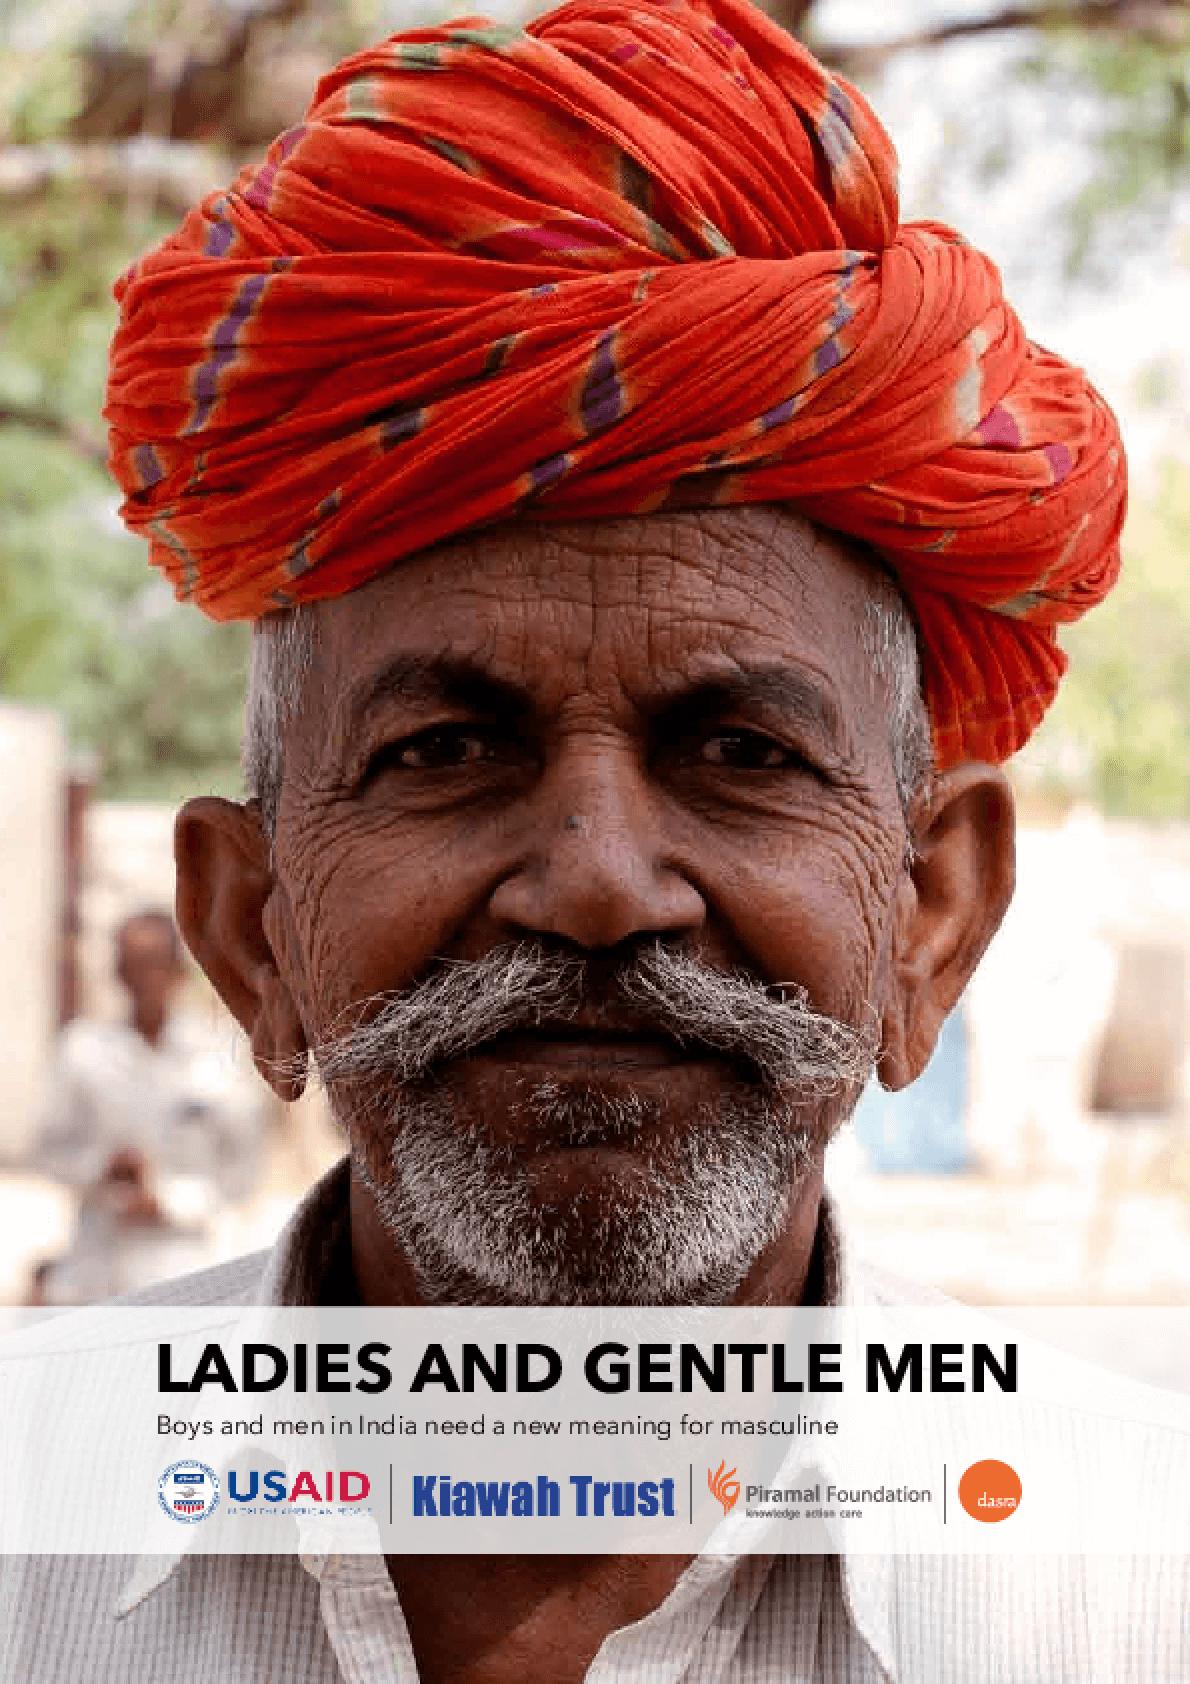 Ladies and Gentle Men: Engaging men and boys